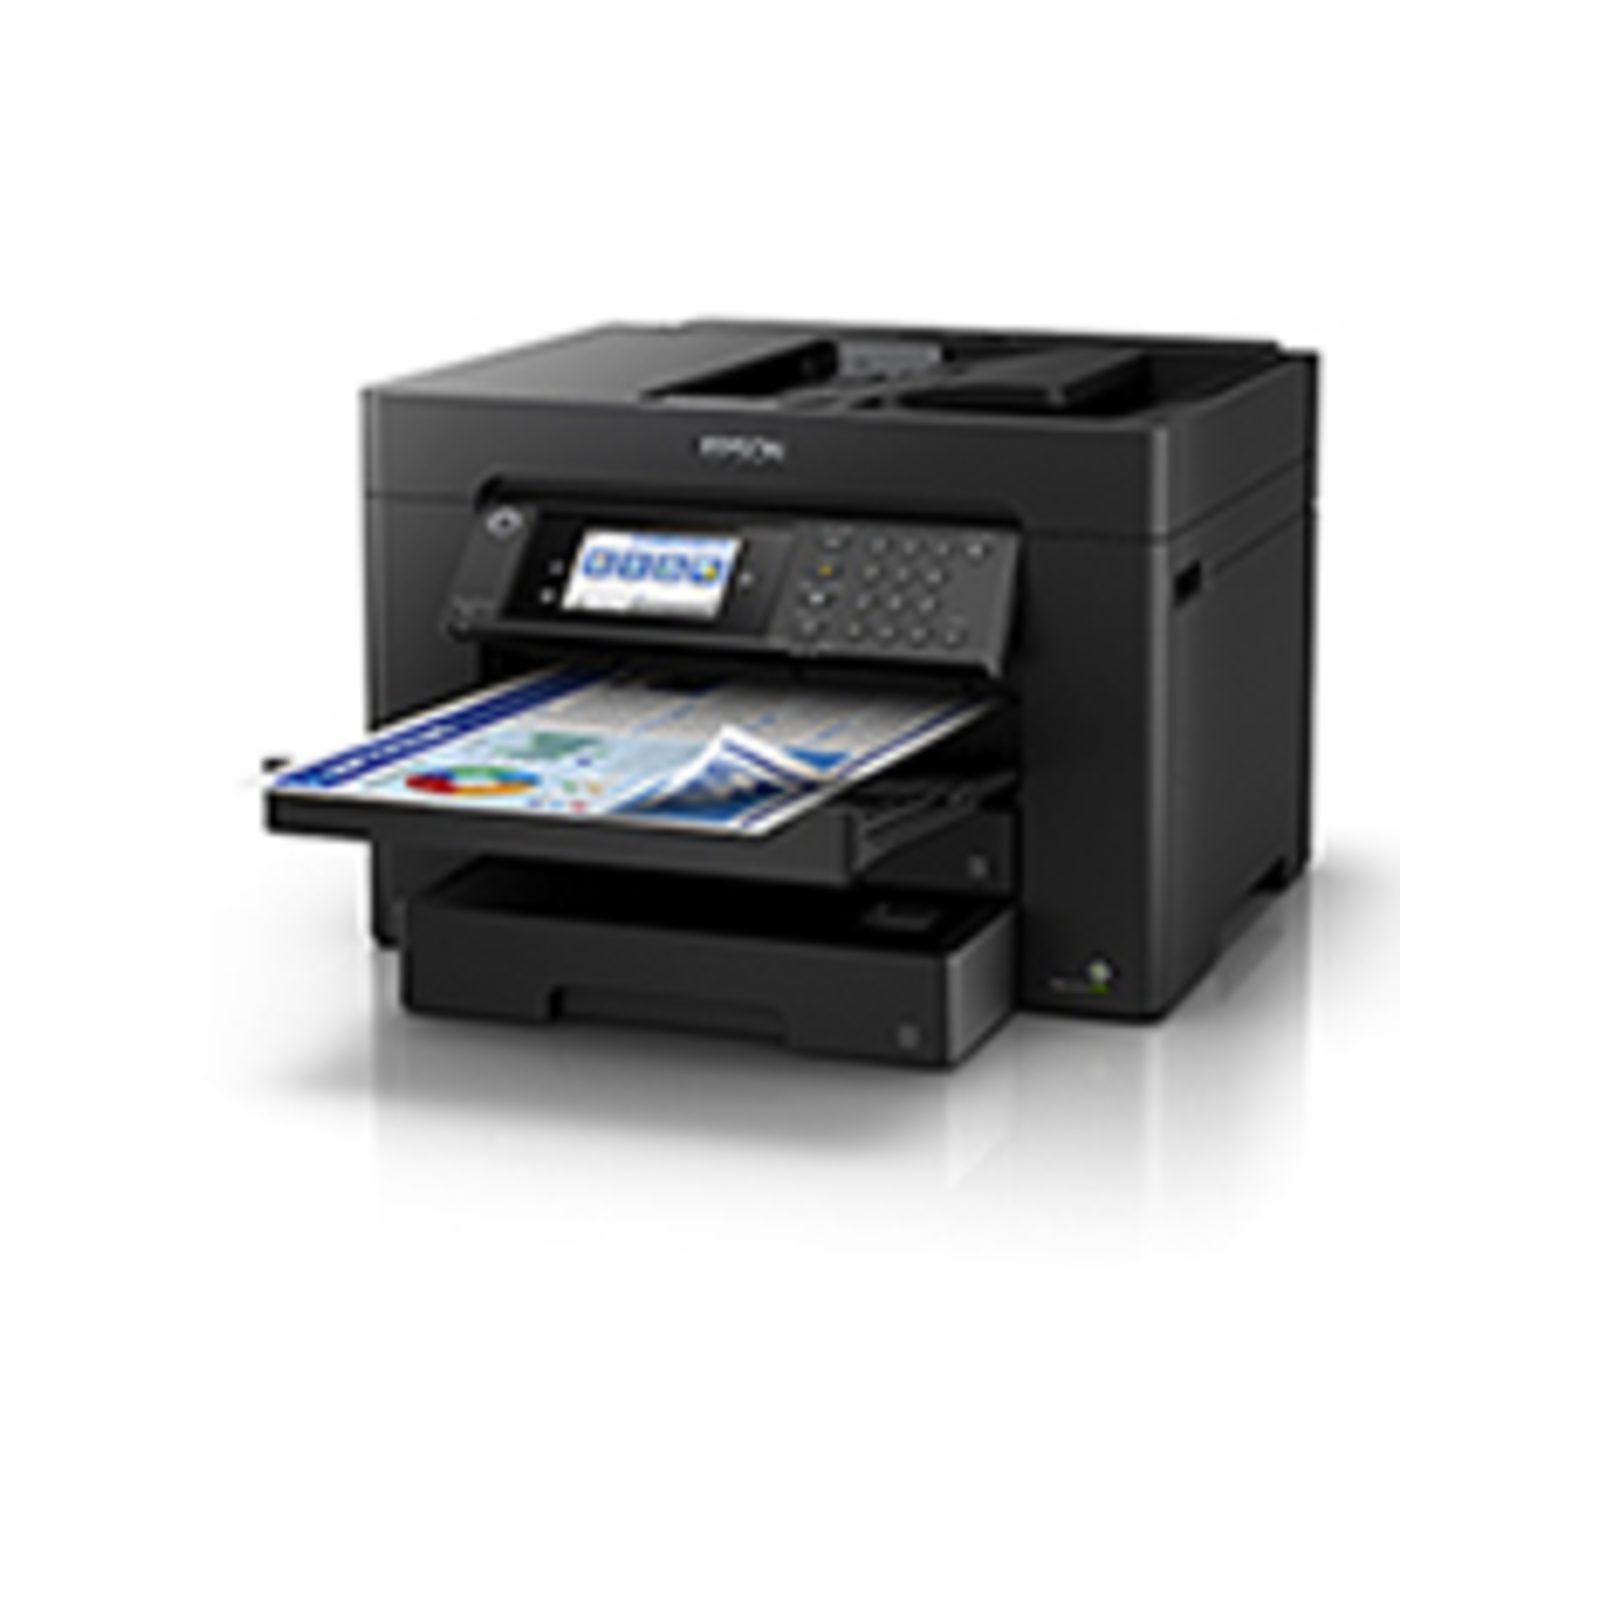 Epson WorkForce WF-7845 Inkjet MFP - A3+ Print, A3 Copy, A3 Scan, Fax, Ethernet, Wi-Fi Direct